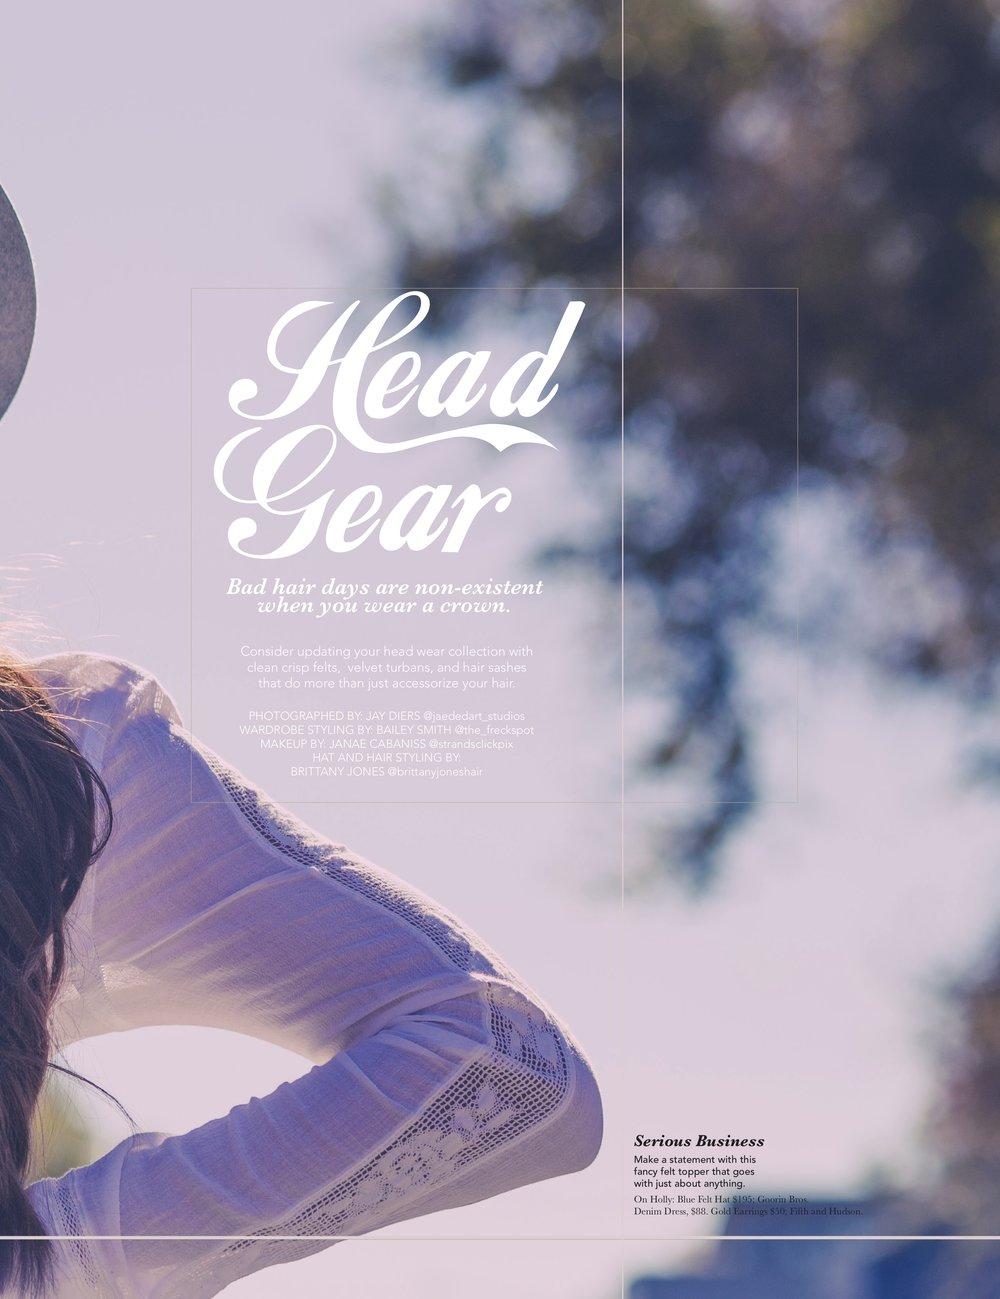 Headgear1.jpg